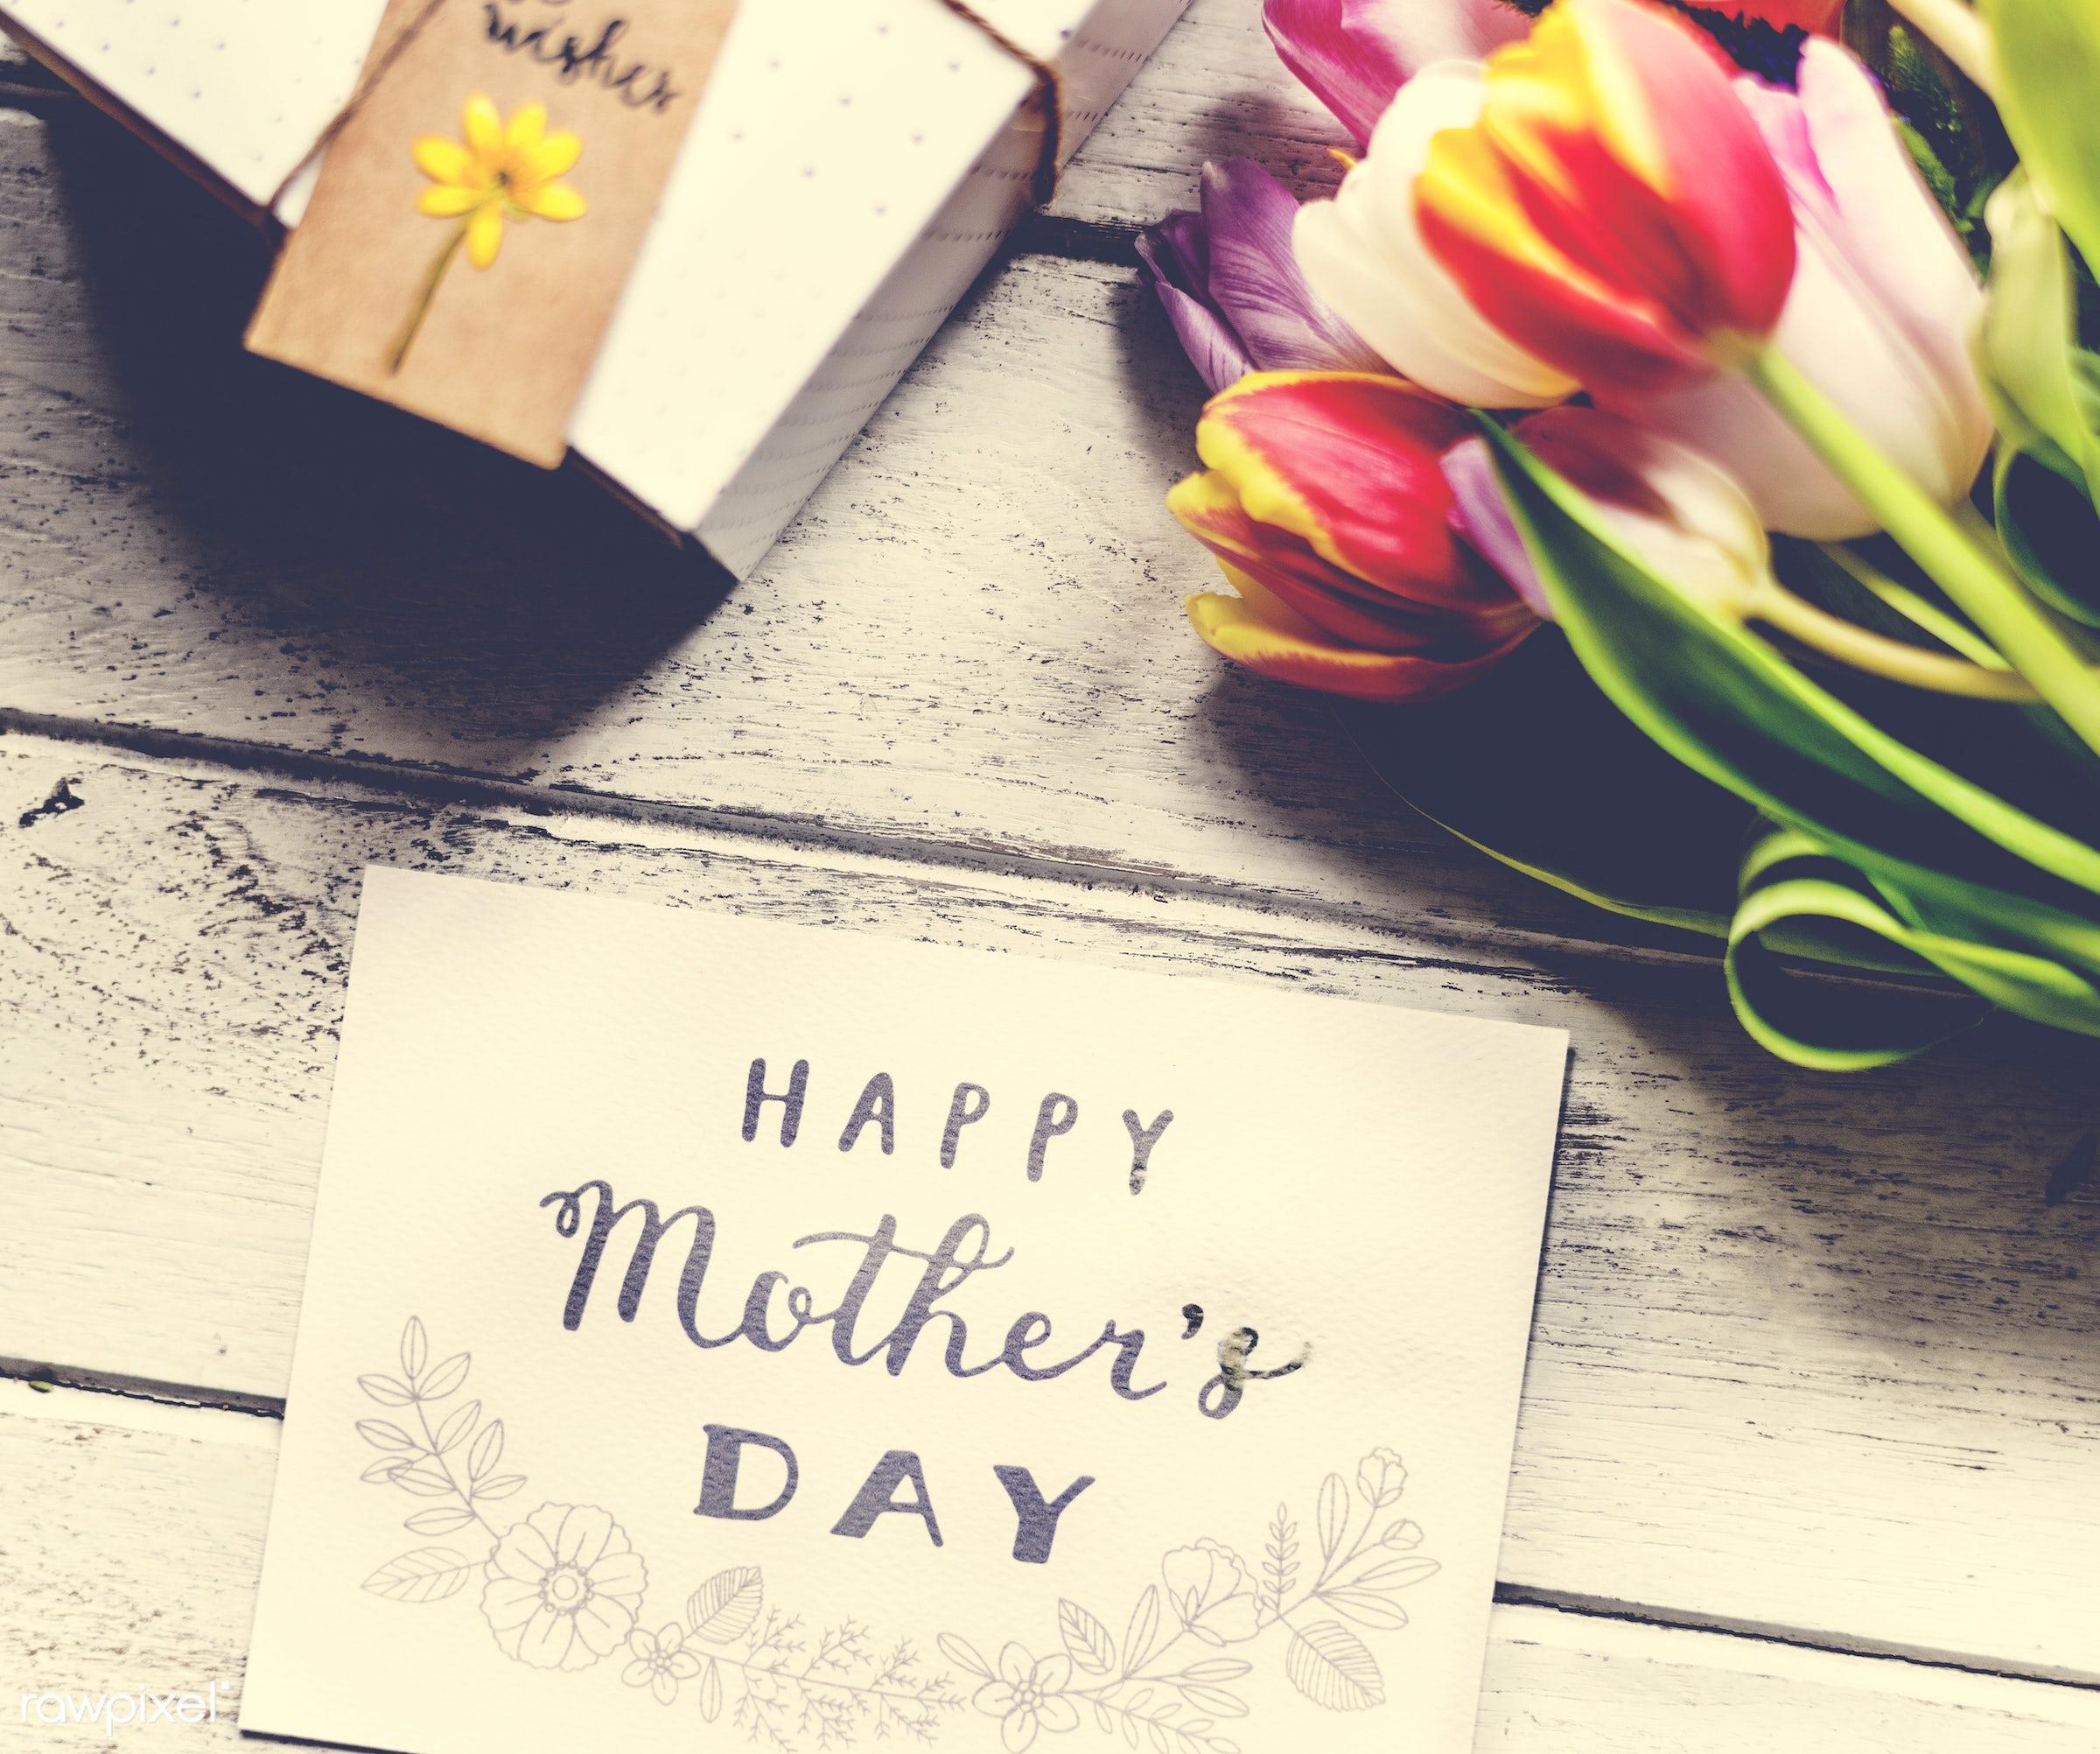 nobody, detail, wish, show, decor, nature, card, flowers, greeting, refreshment, florist, present, arrangement, mother, day...